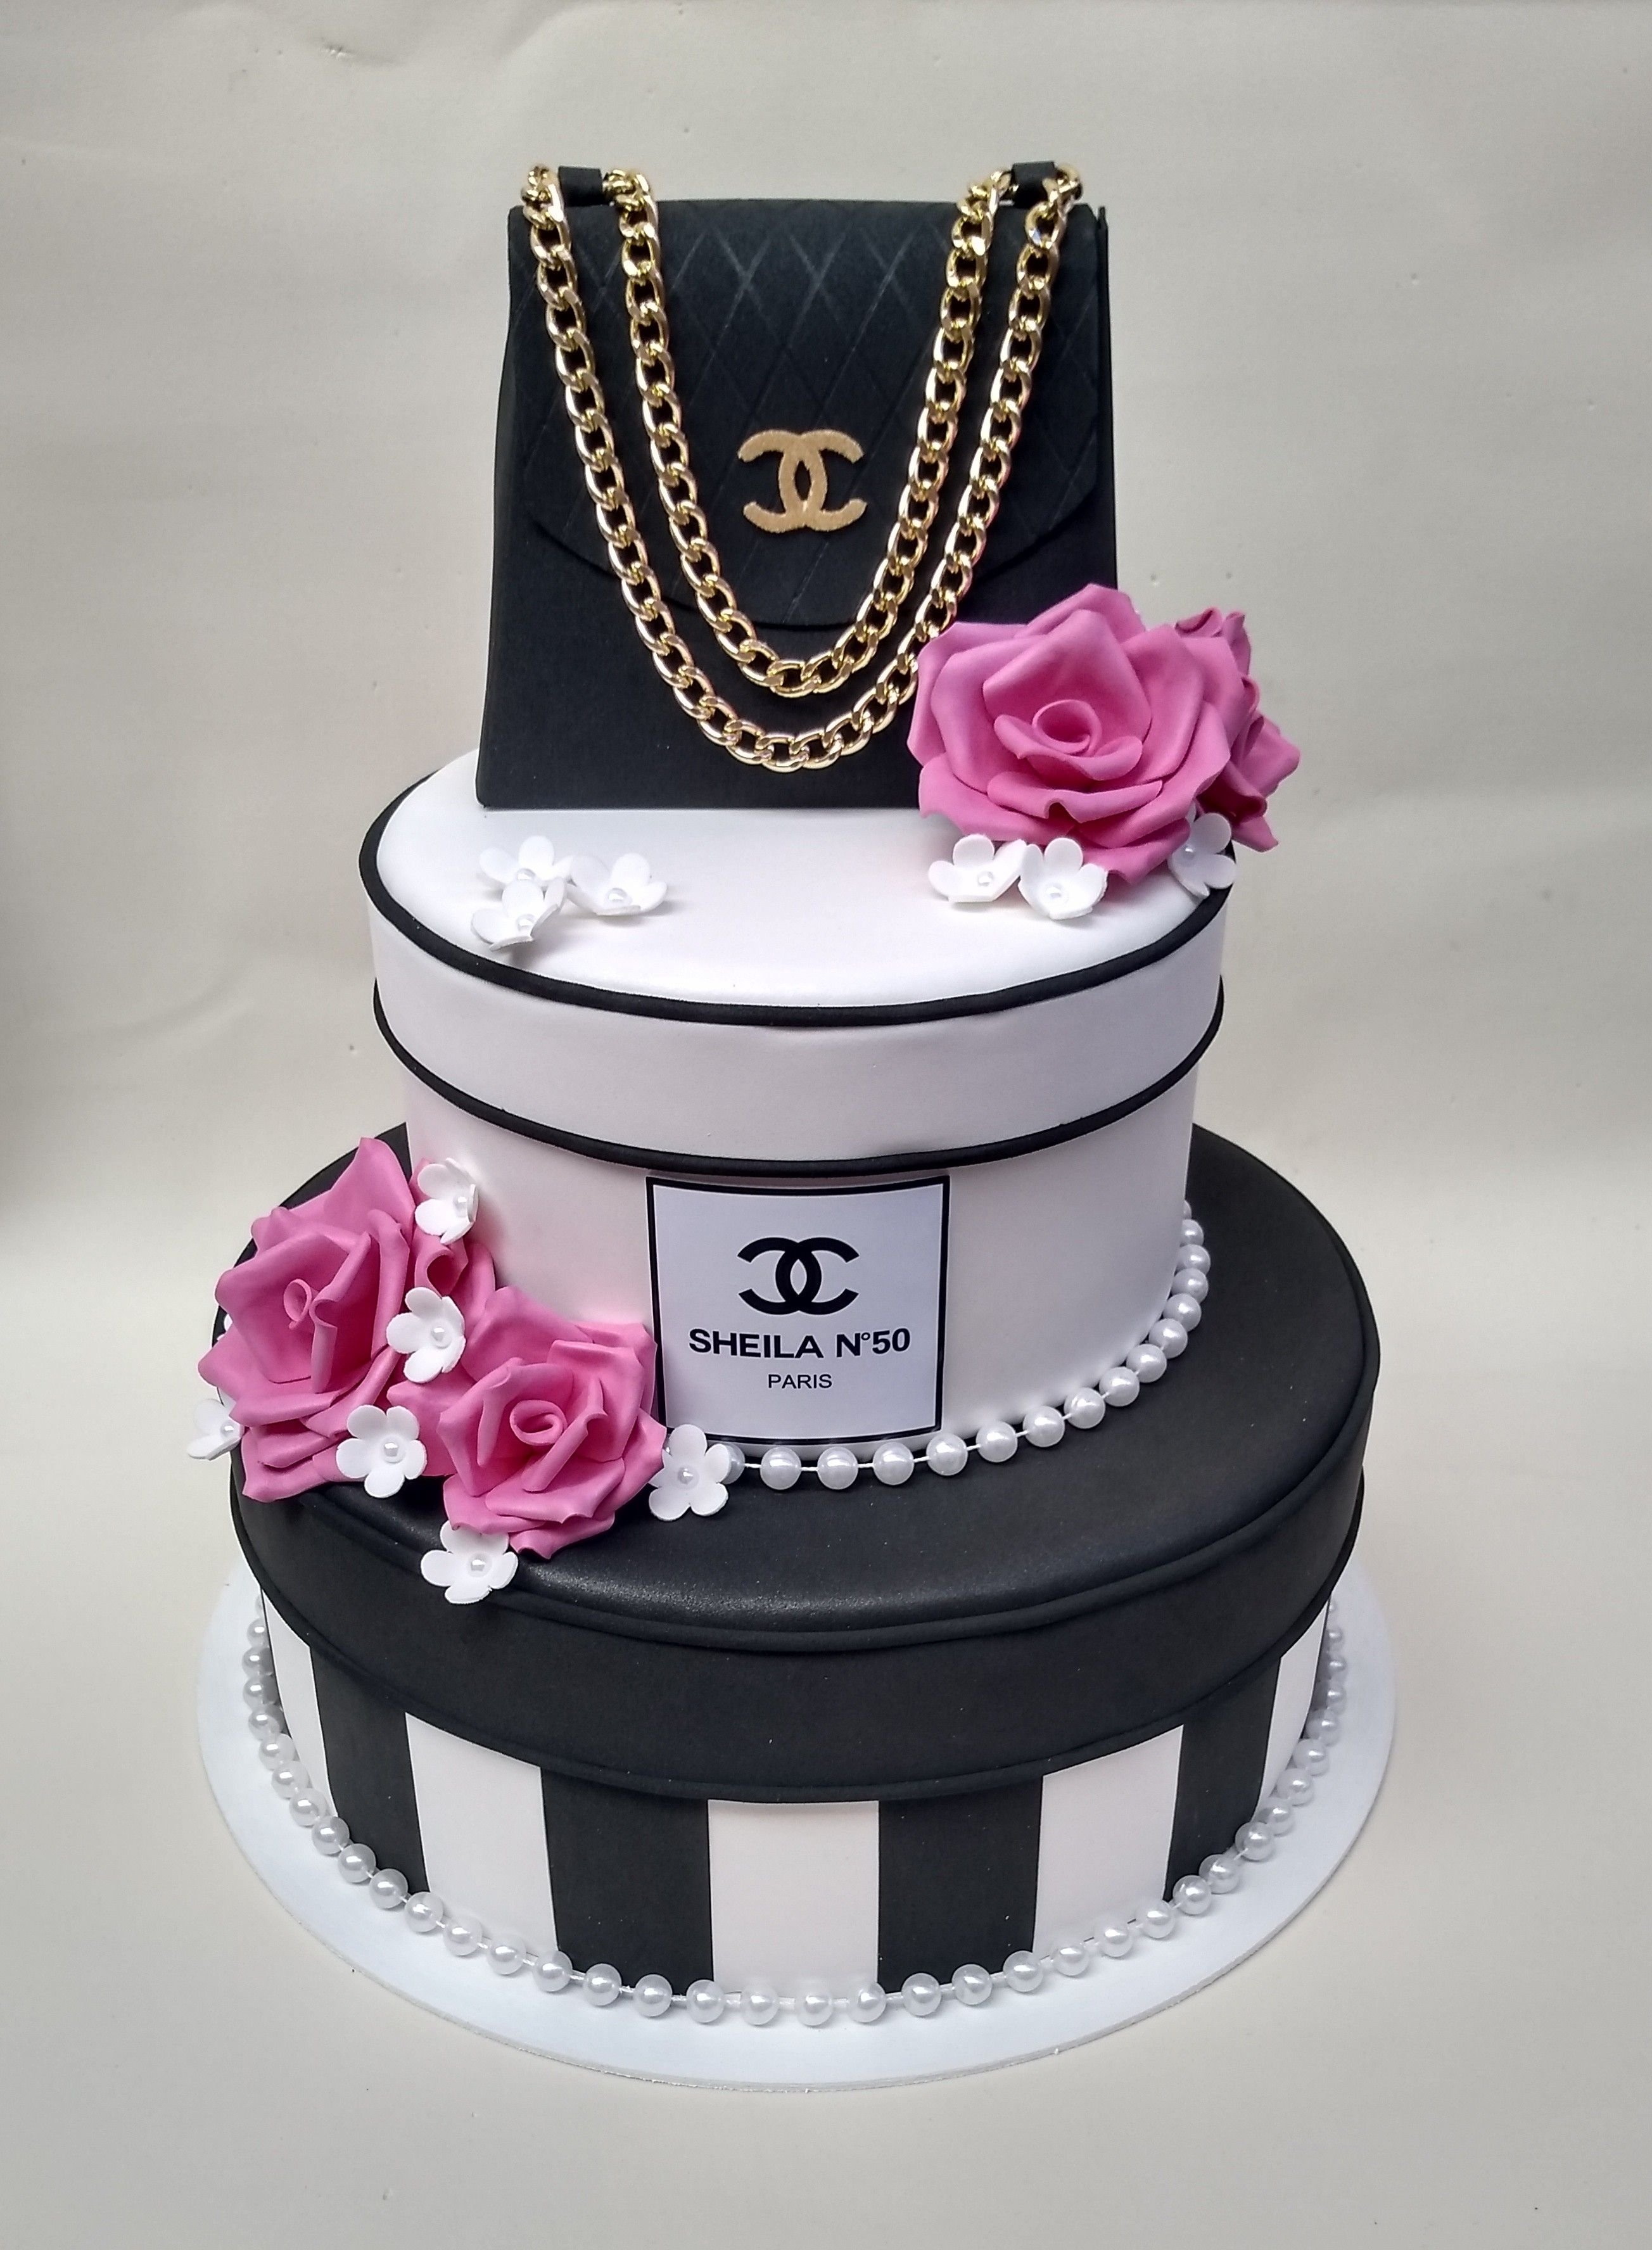 O Tema Chanel Traz Delicadeza E Elegancia A Decoracao Nesse